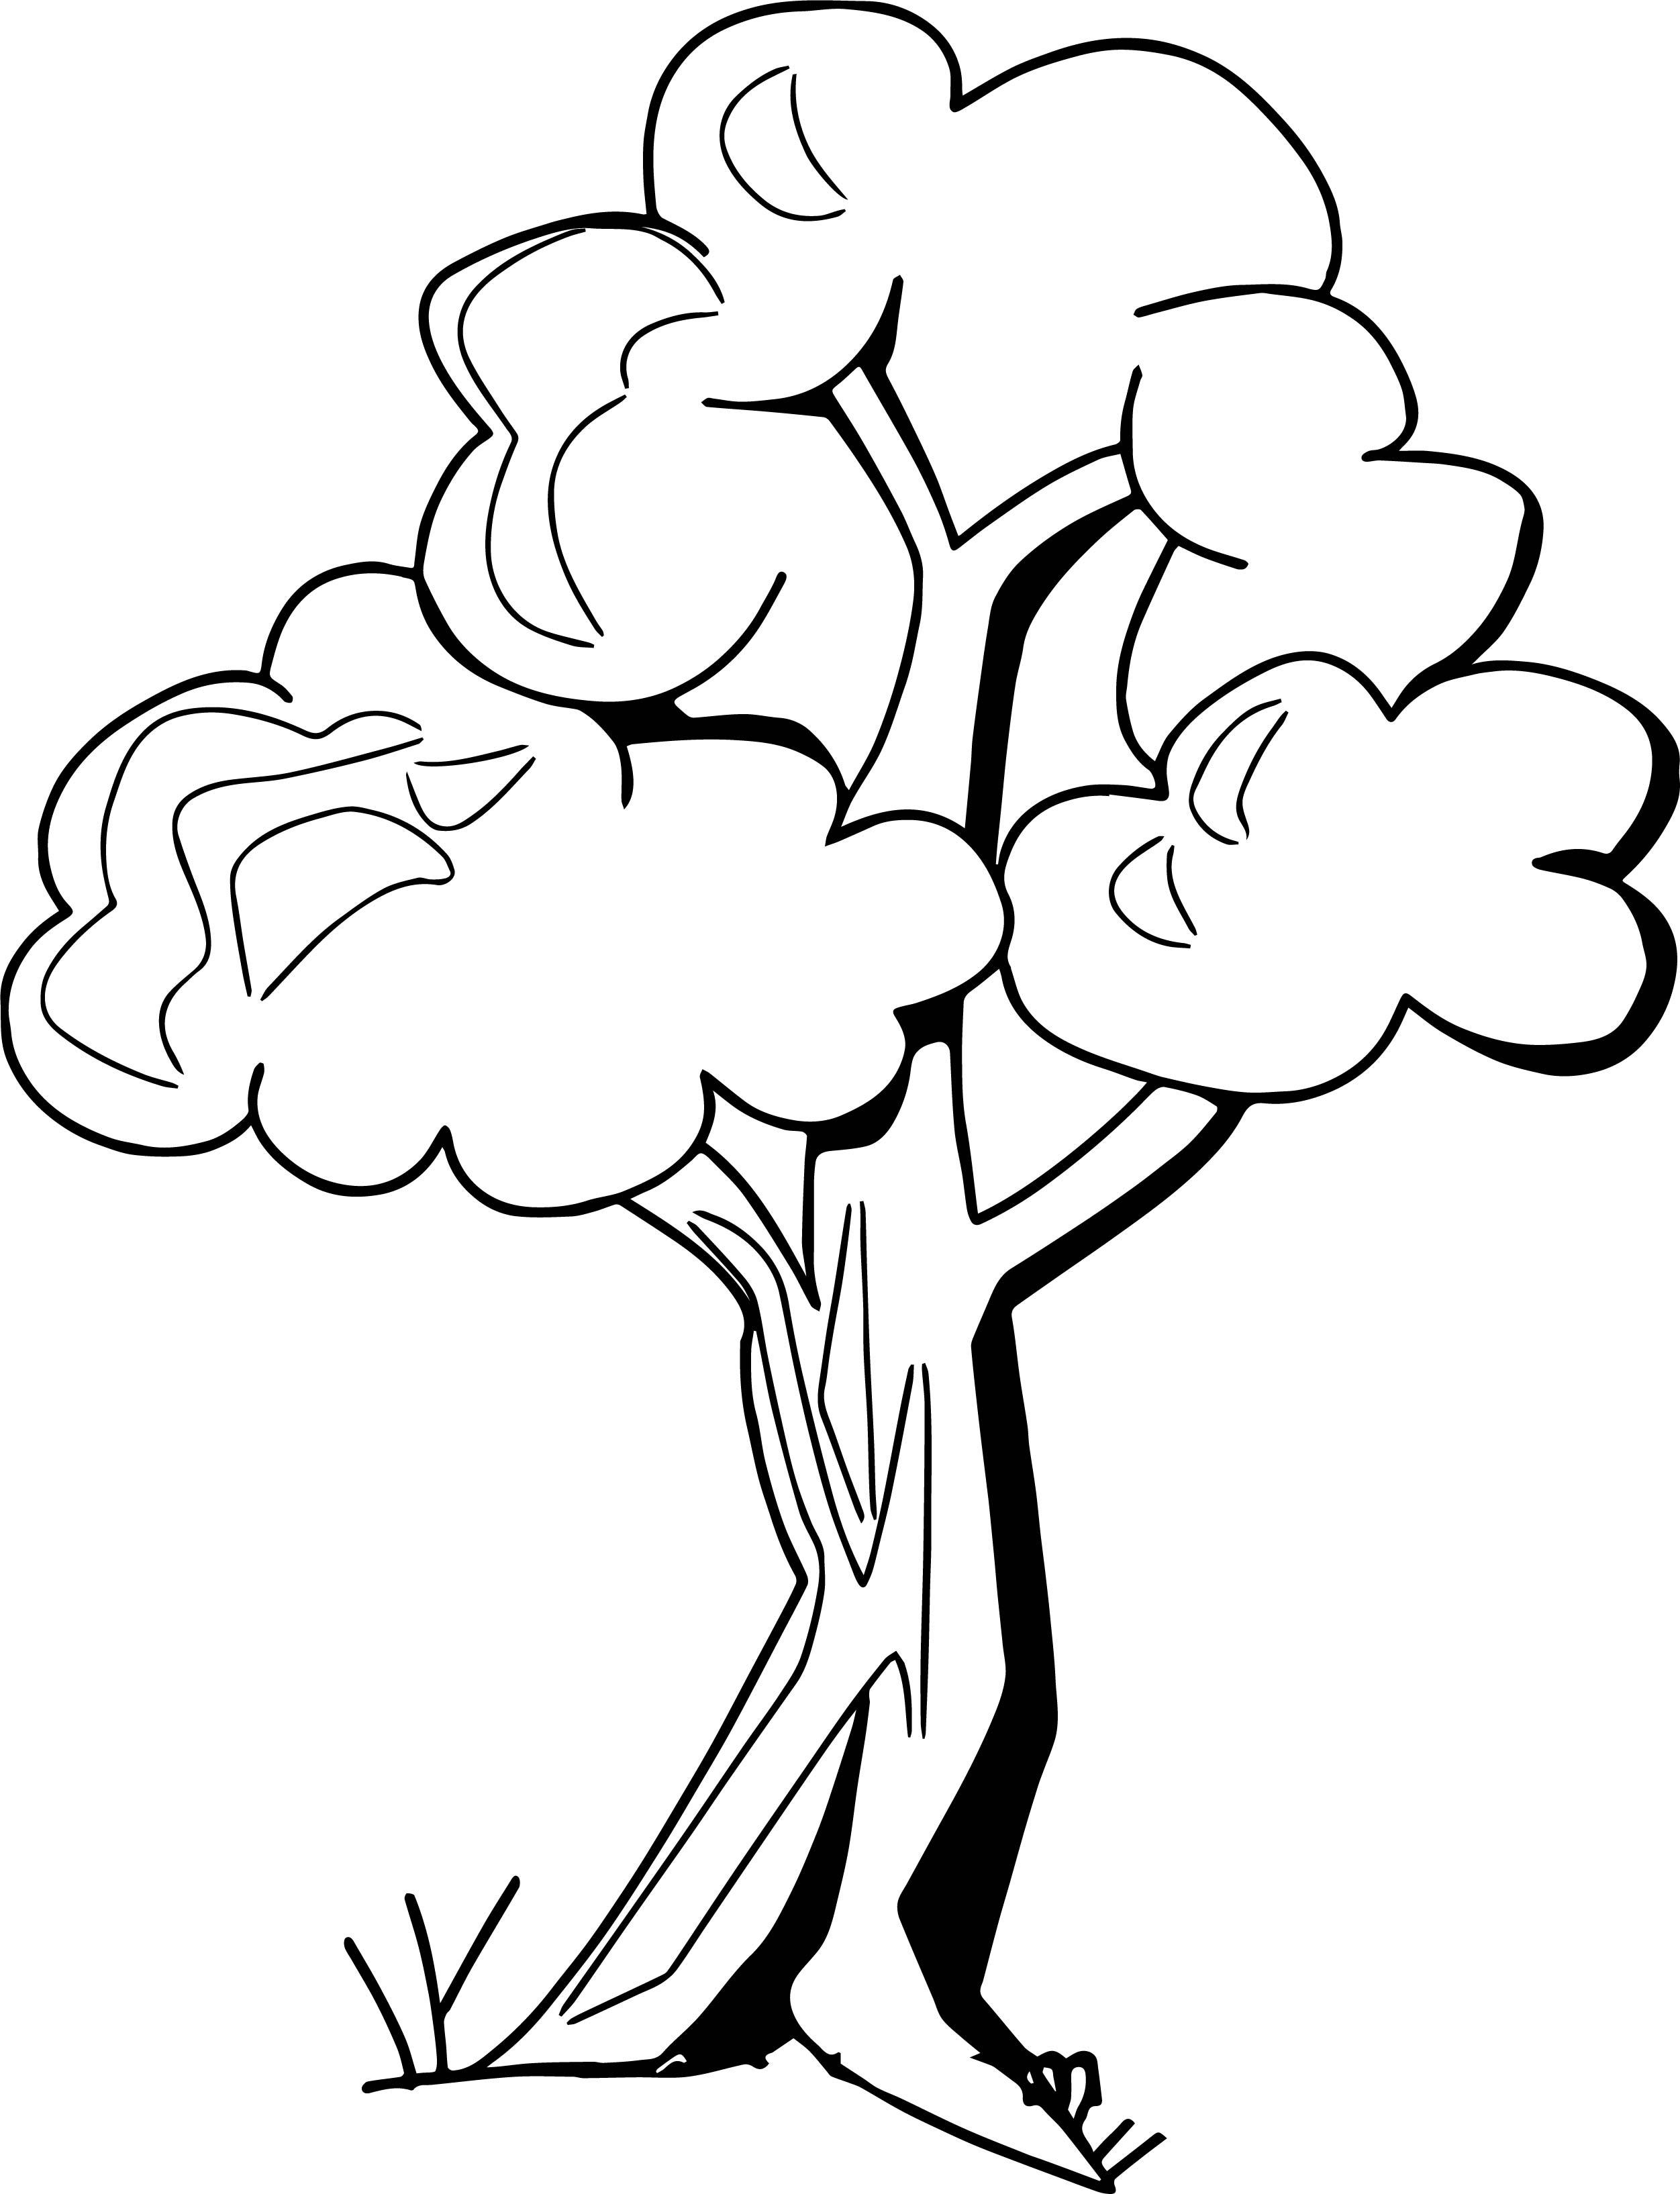 Zany Apple Tree Coloring Page   Wecoloringpage.com